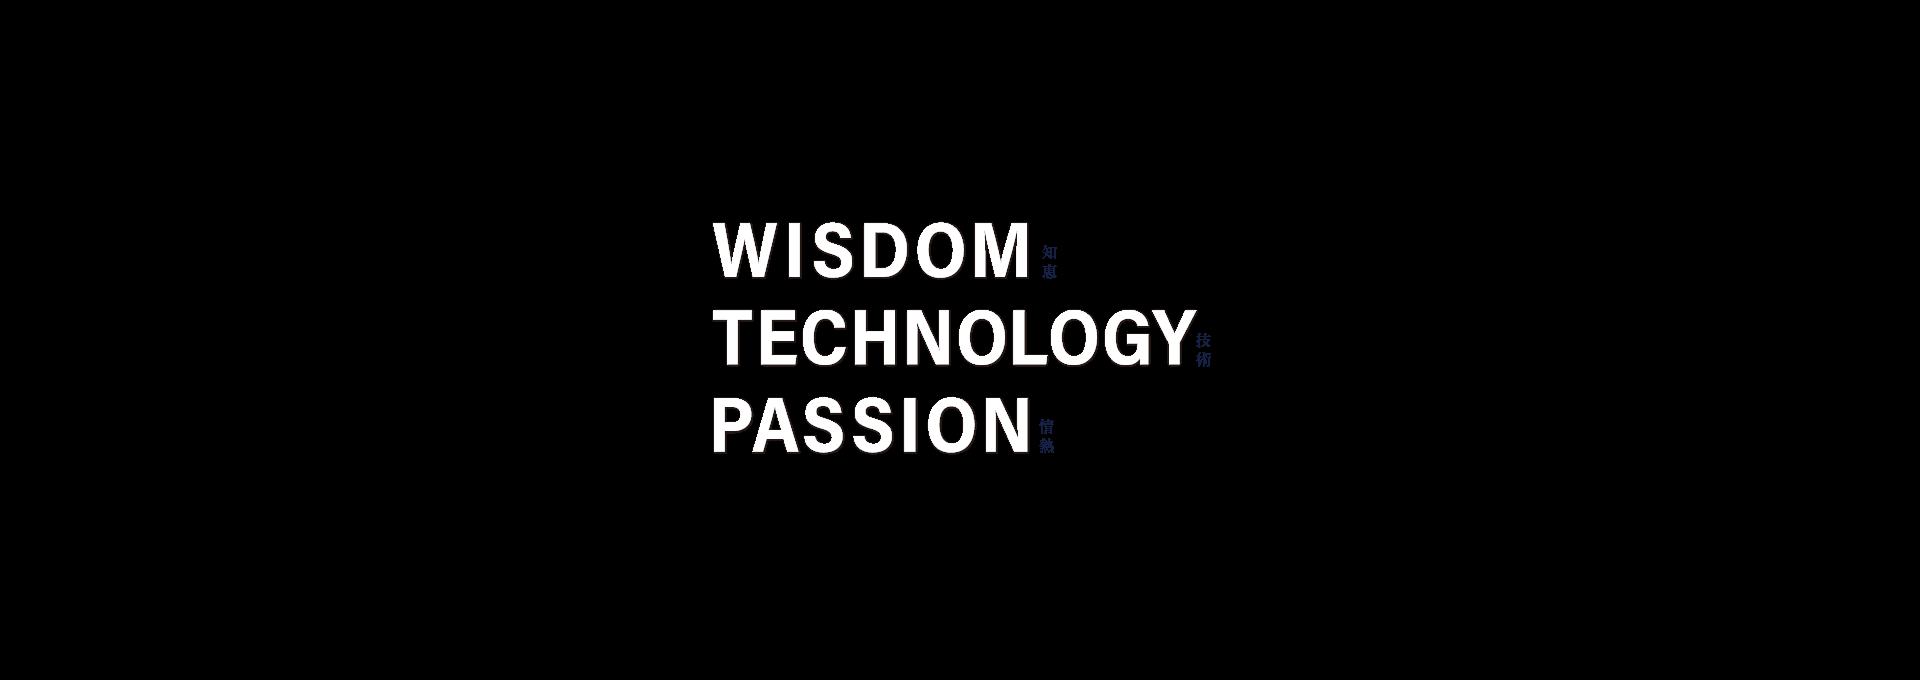 WISDOM(知恵)✕TECHNOLOGY(技術)✕PASSION(情熱)